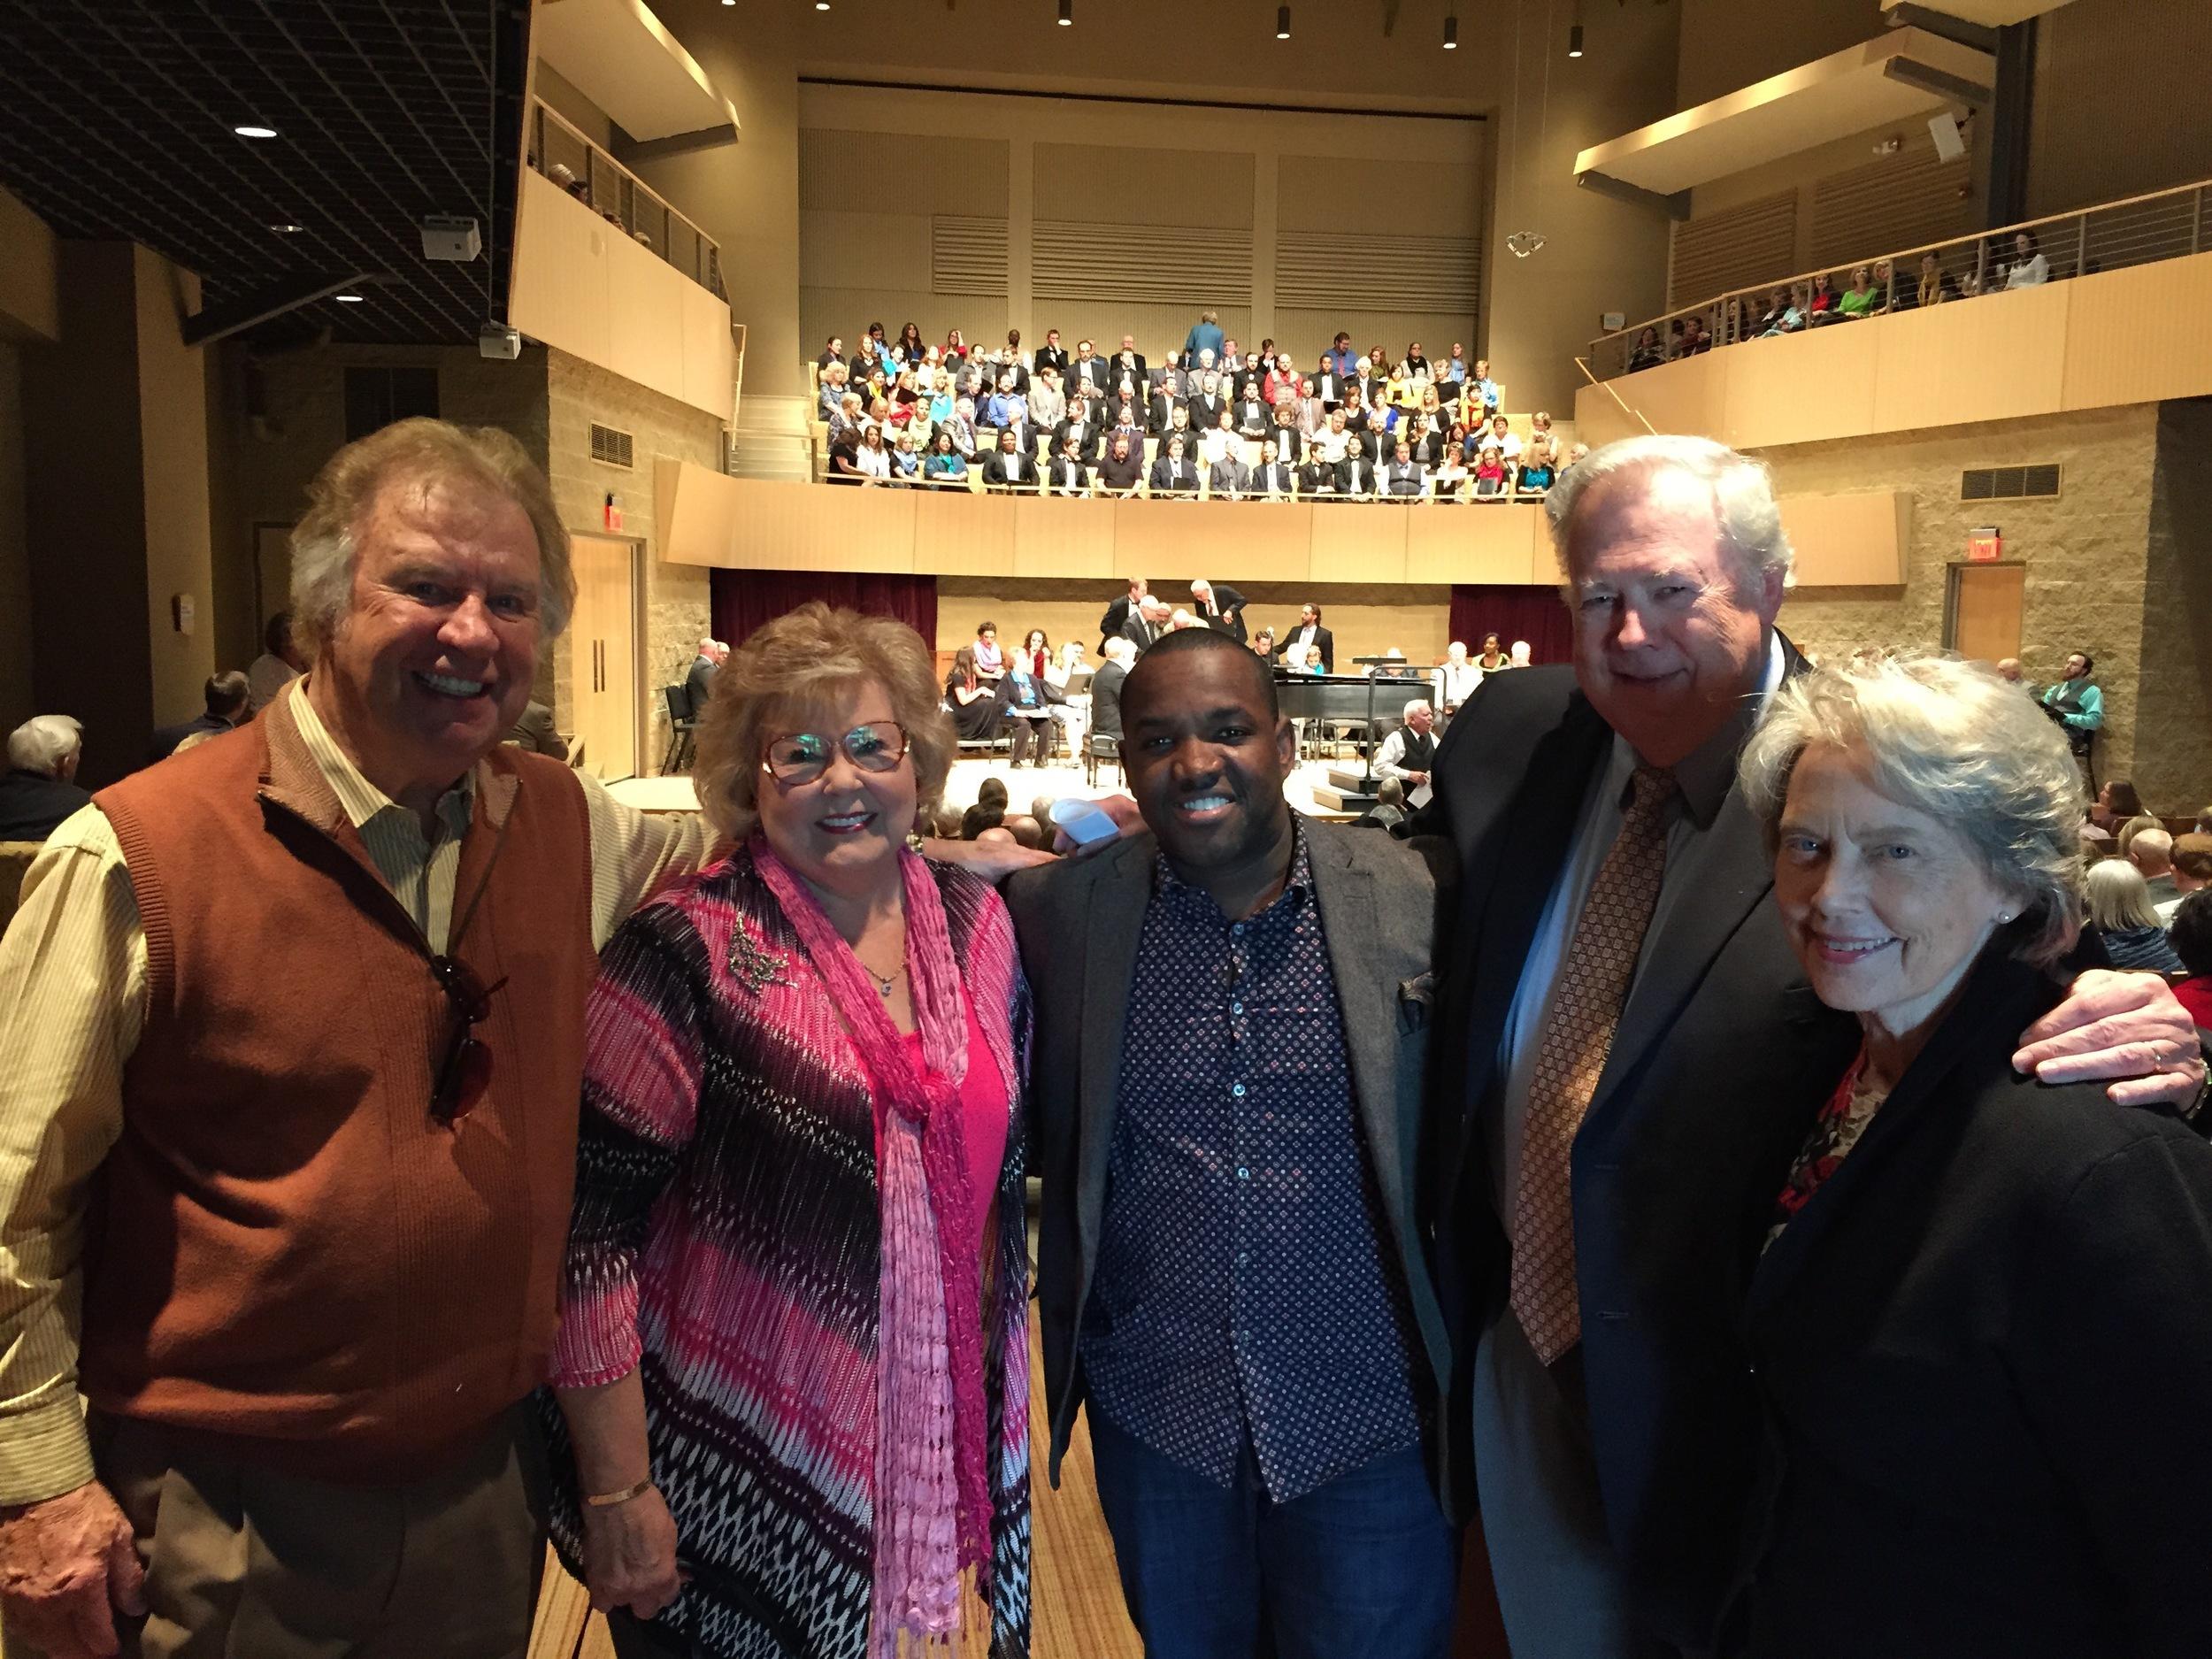 Bill and Gloria Gaither, James and Deanna Edwards